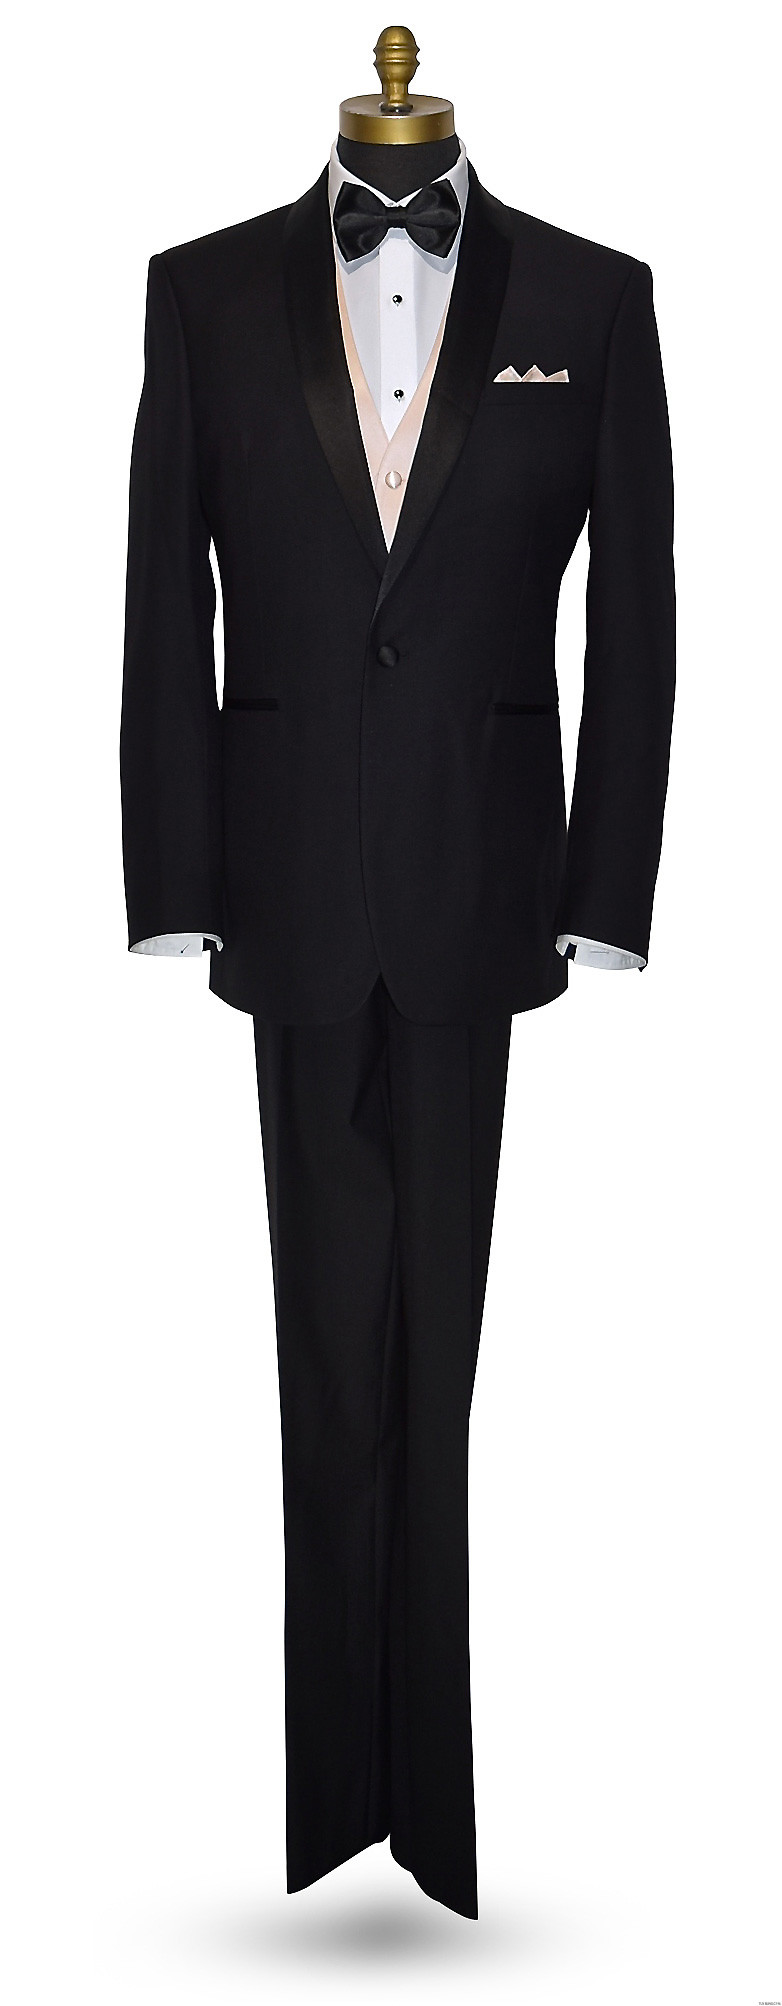 men's nude color vest with black bowtie and black tuxedo